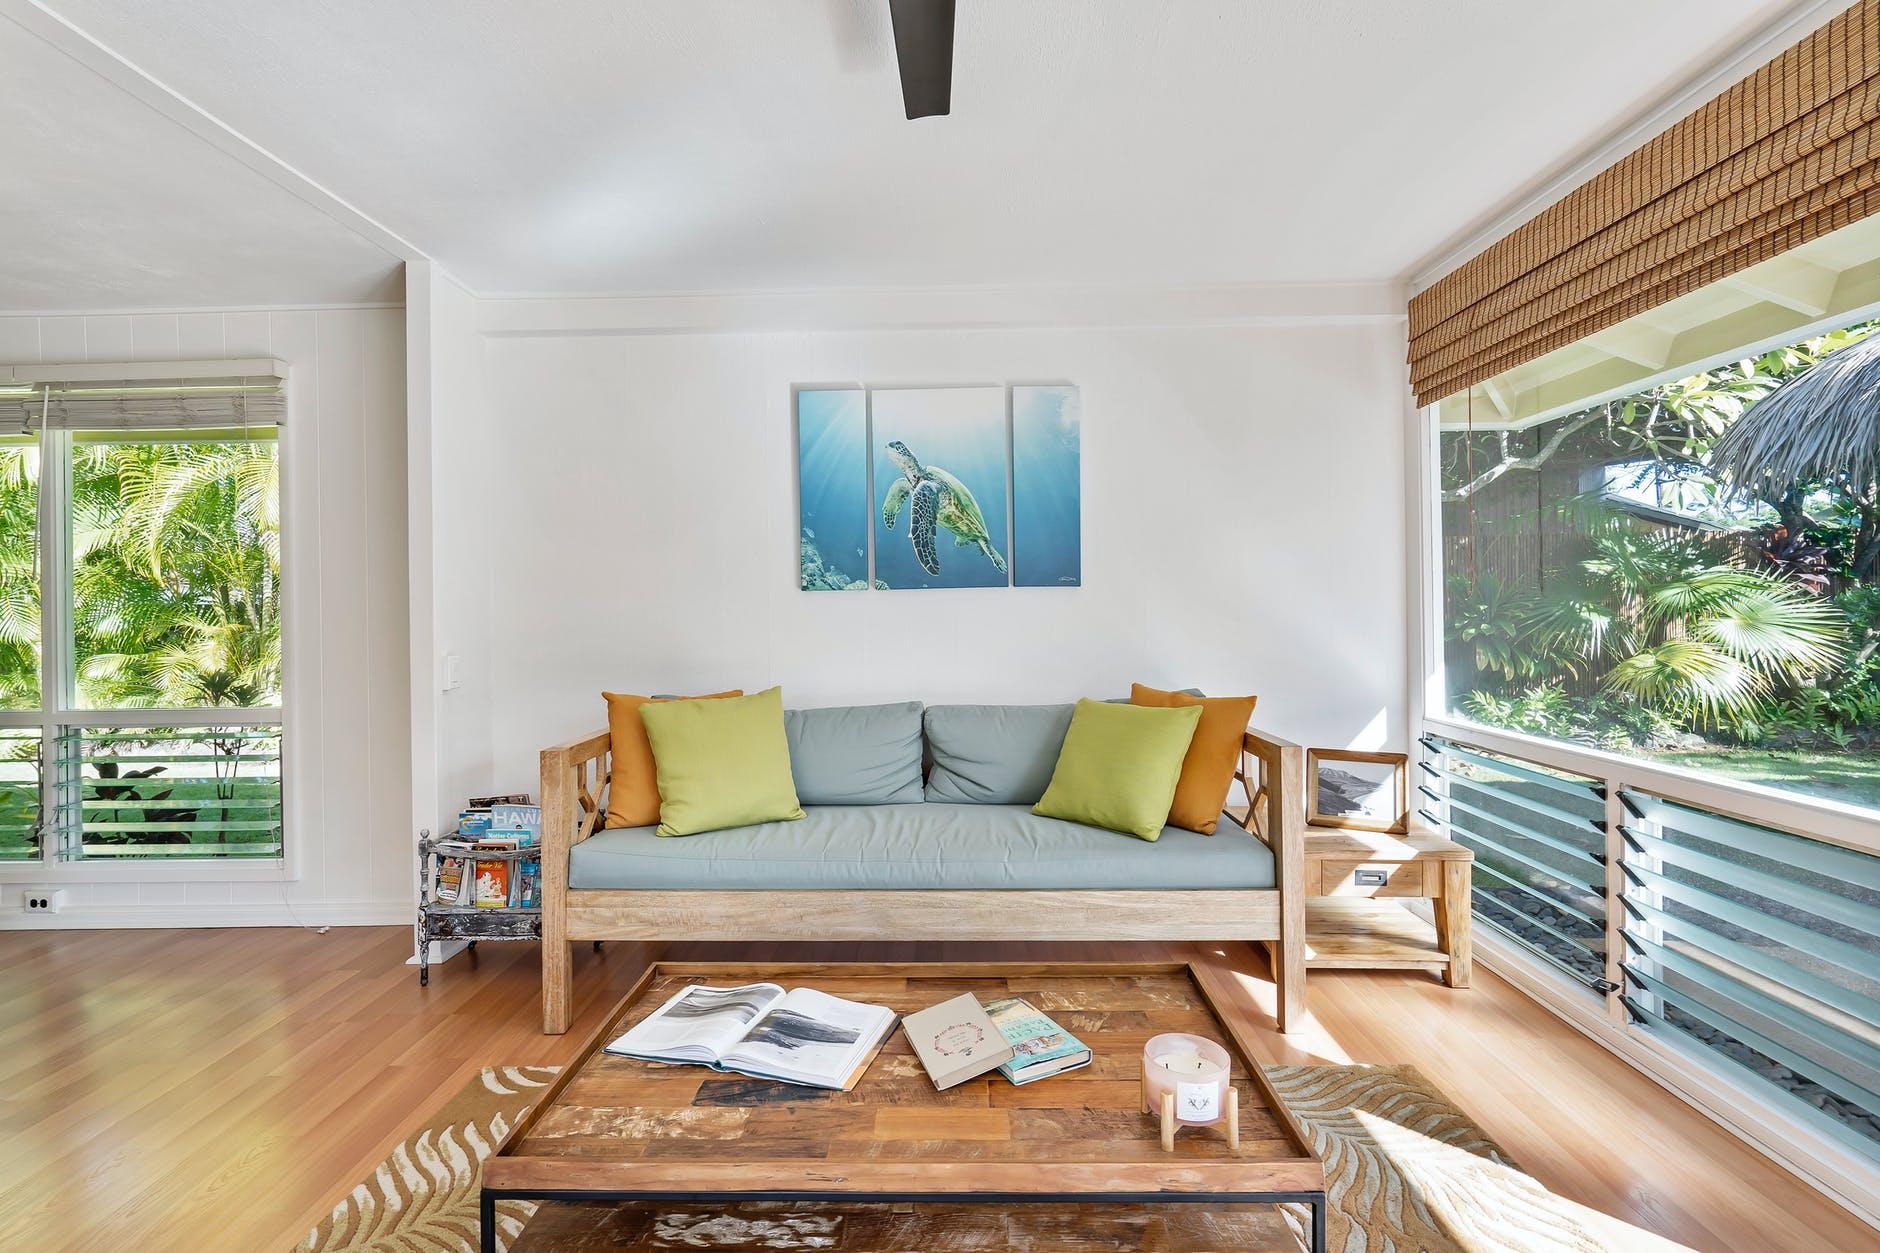 Sofa og stue